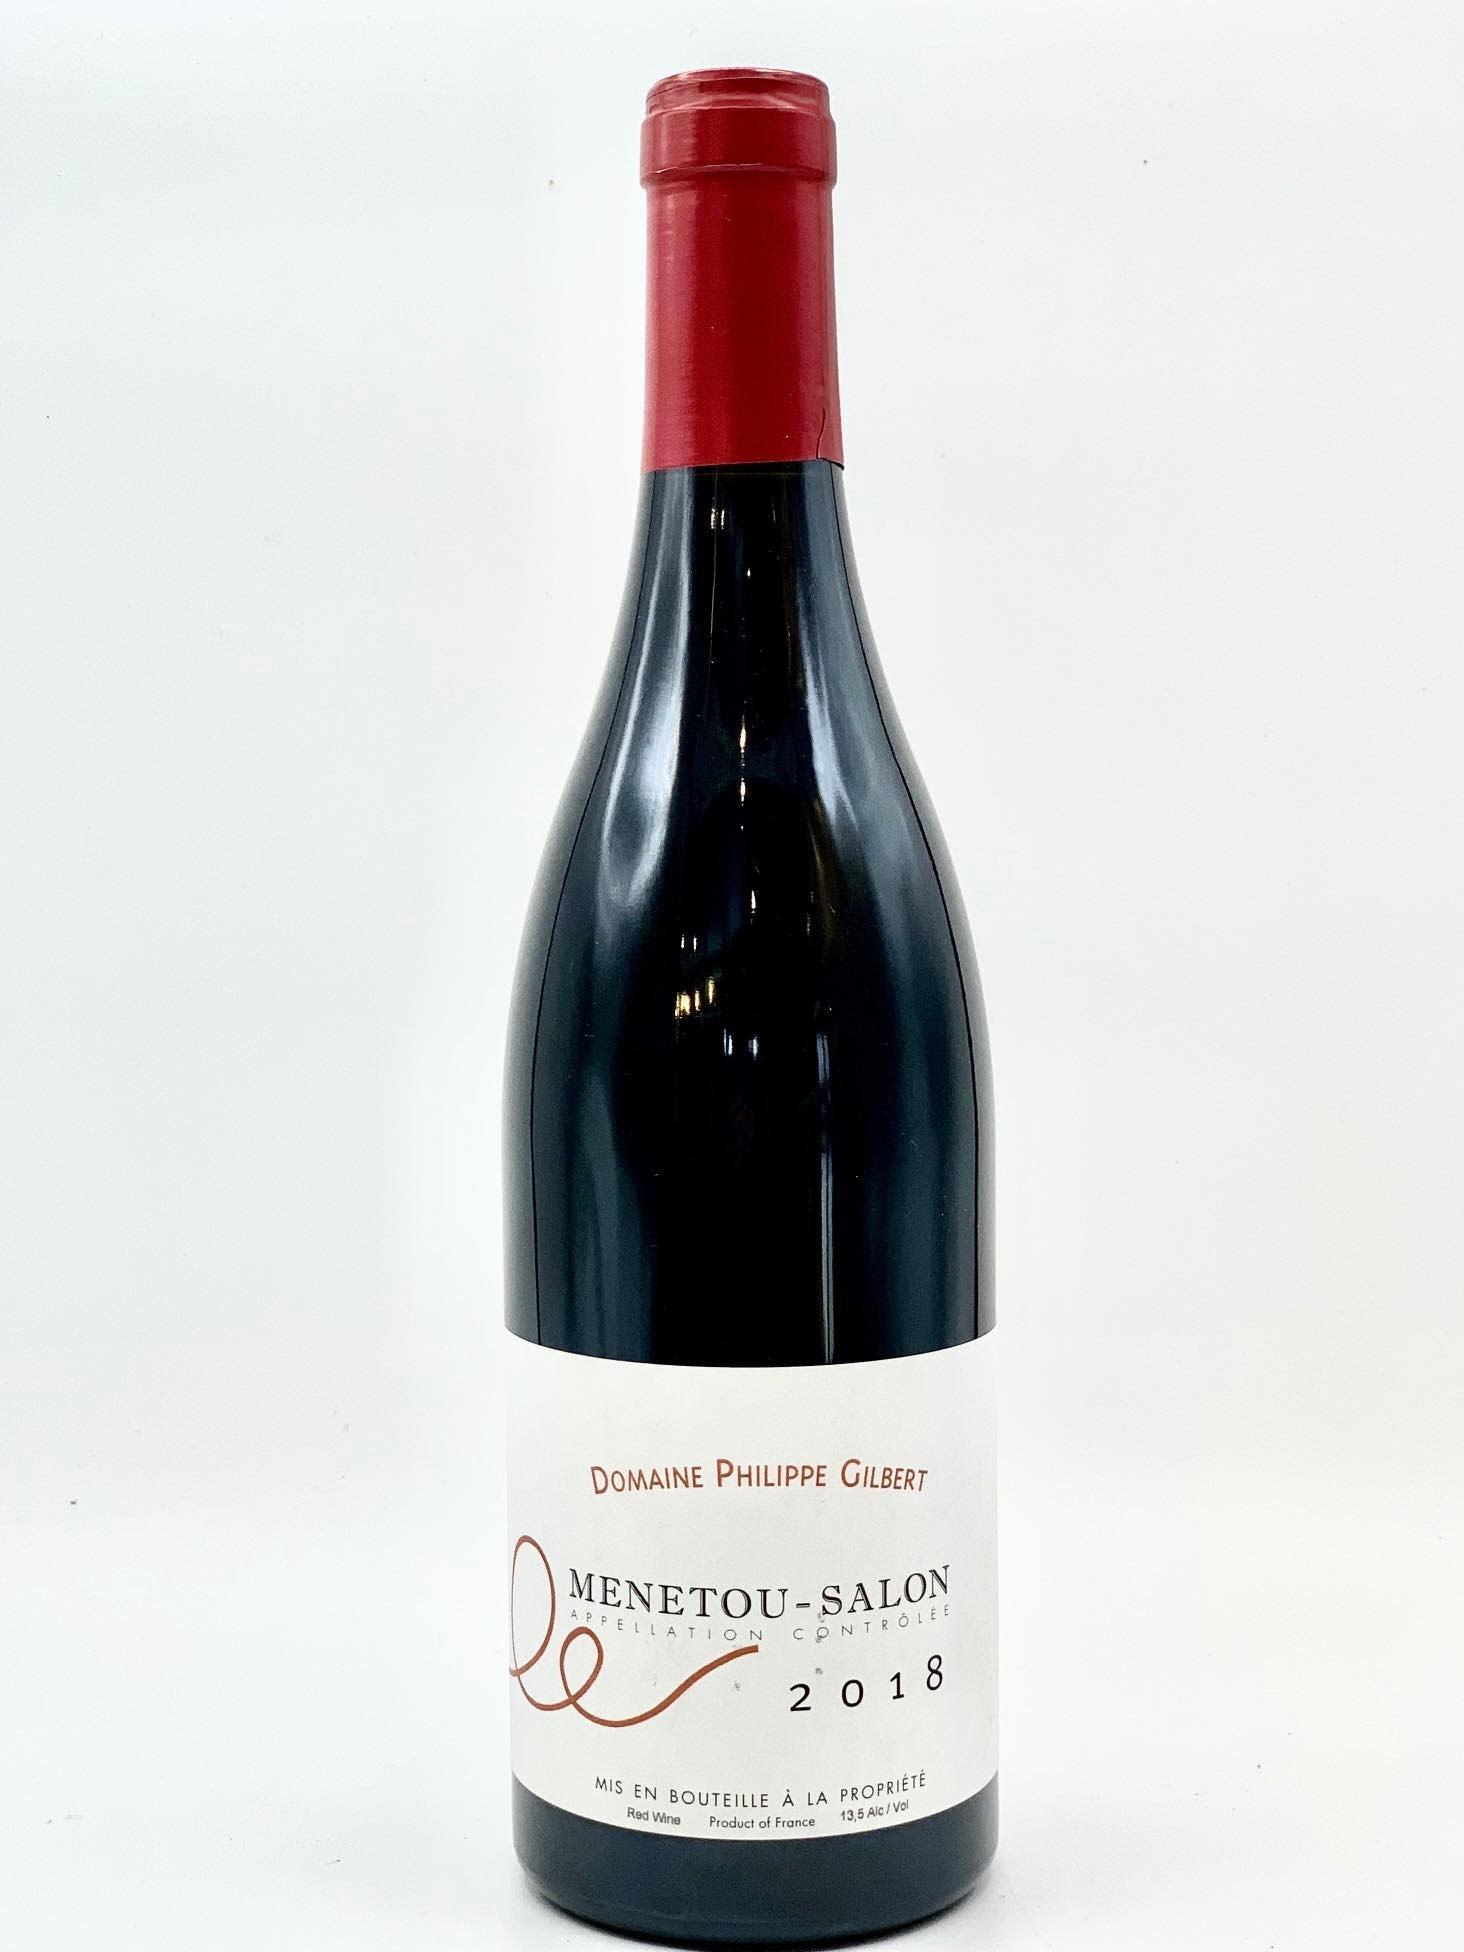 Menetou Salon Rouge 2018 Domaine Philippe Gilbert  750ml